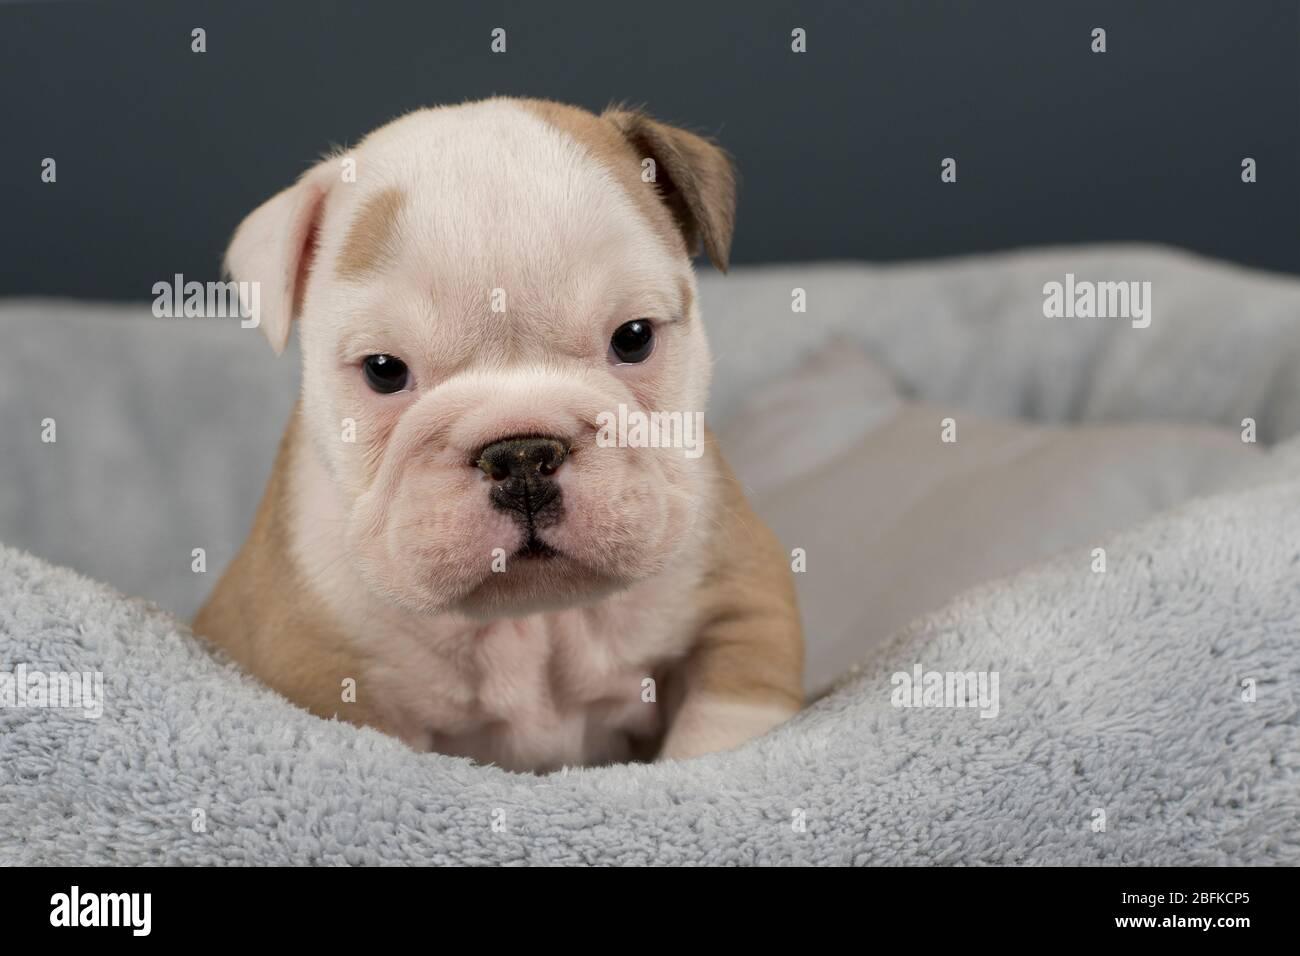 English Bulldog Puppy On Gray Background Stock Photo Alamy